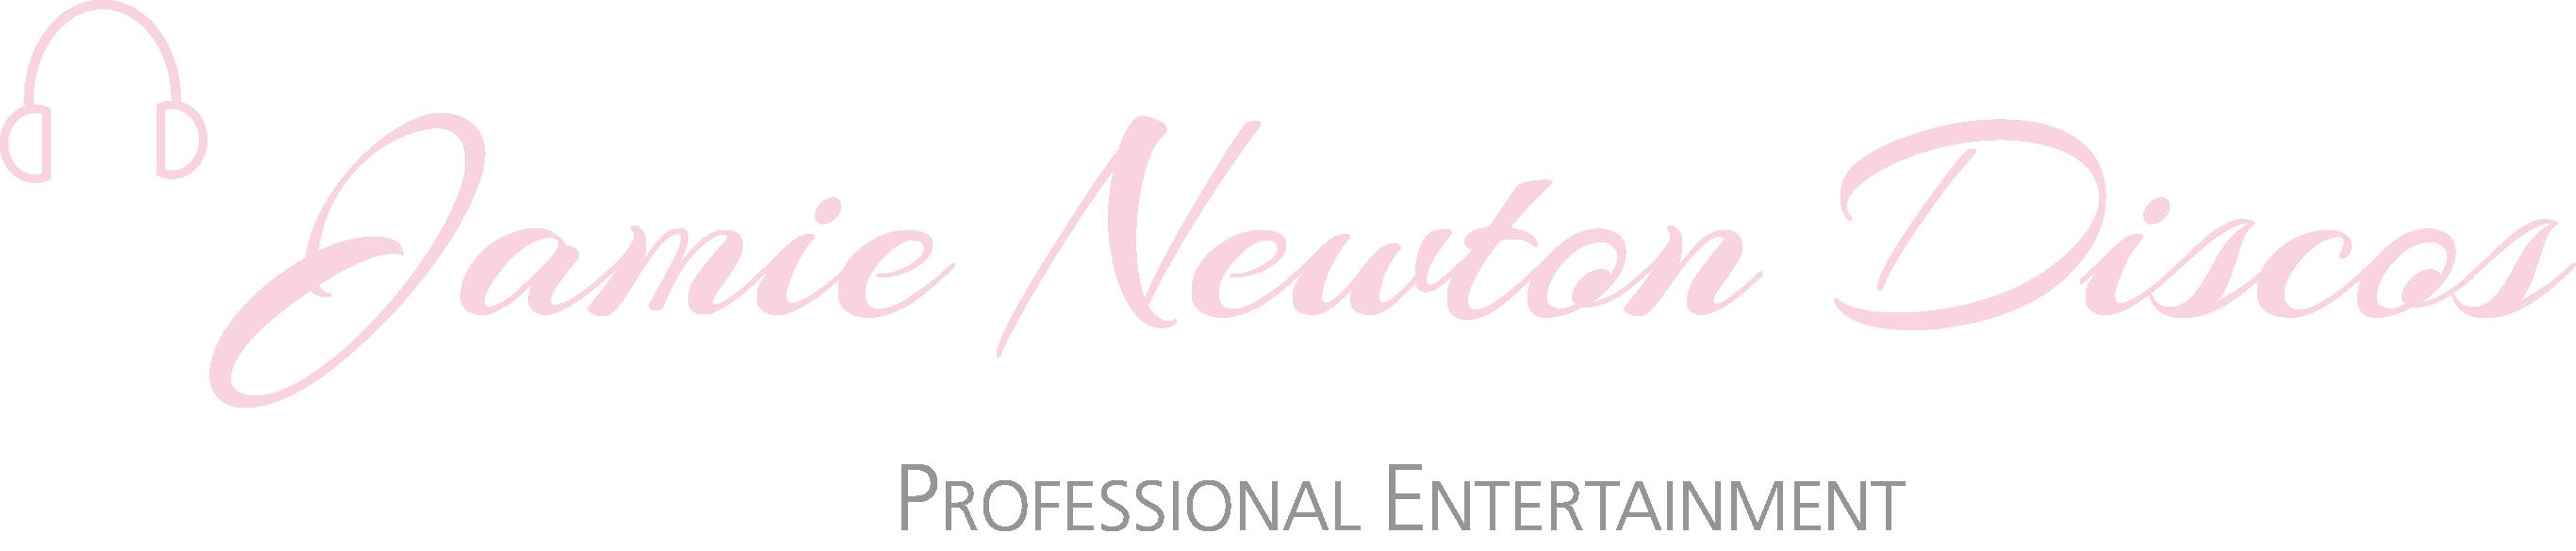 Logo design norfolk